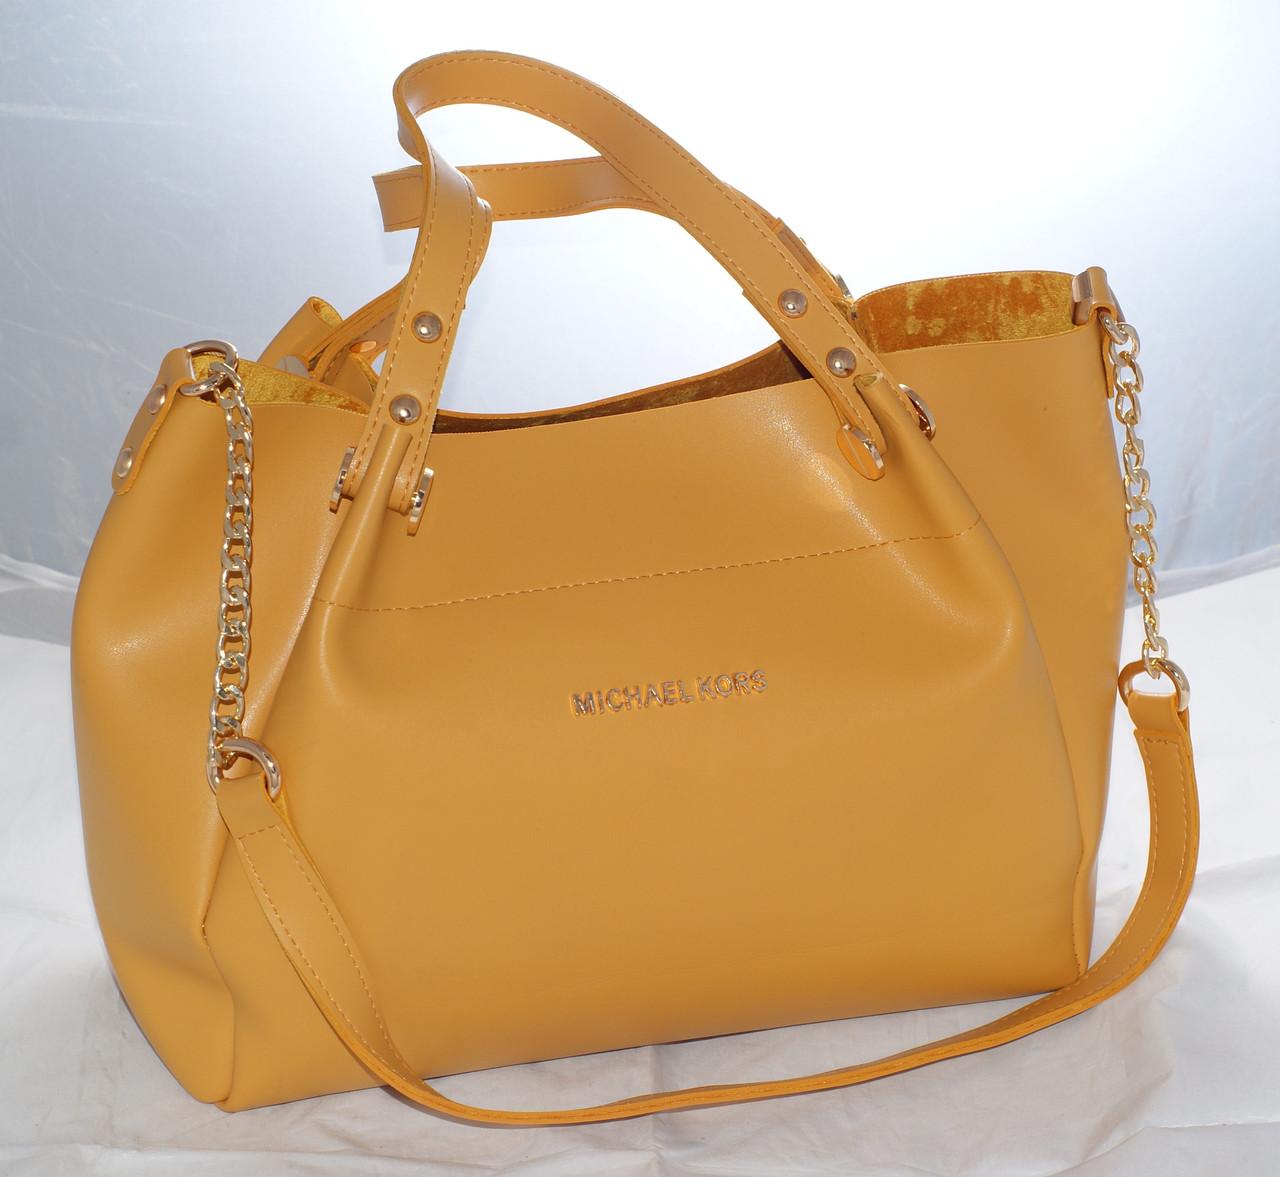 4dce7a37d0e7 Женская сумка Michael Kors (Майкл Корс), желтая  продажа, цена в ...